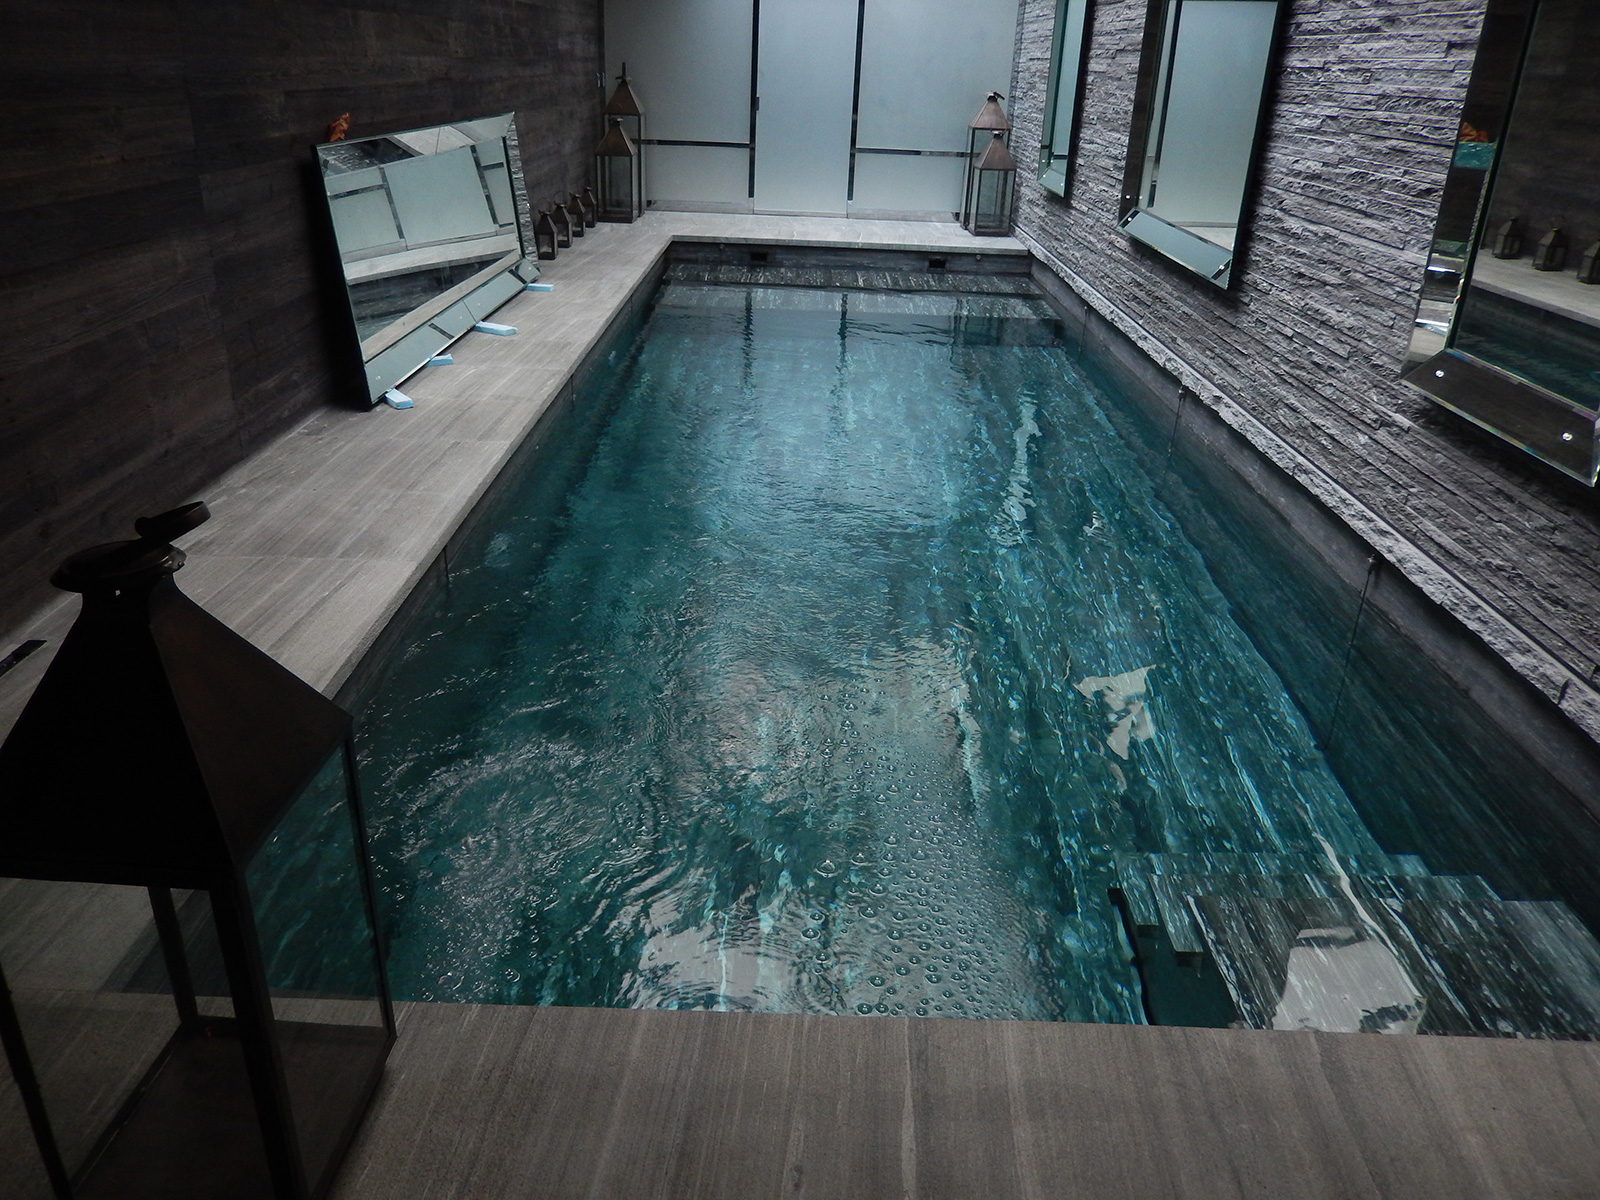 Emejing piscine noire images for Toile solaire piscine prix